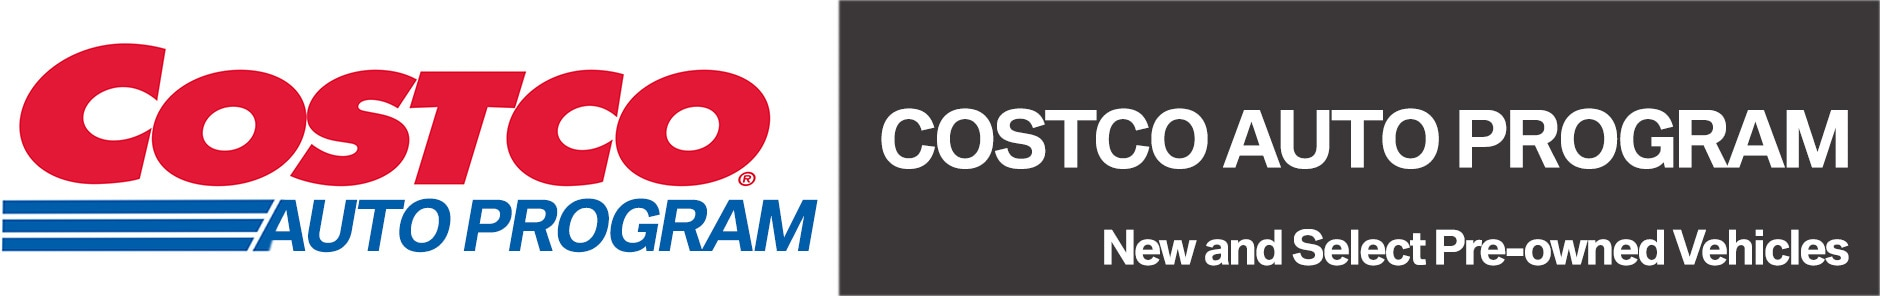 Costco Auto Program >> Bmw Costco Auto Program